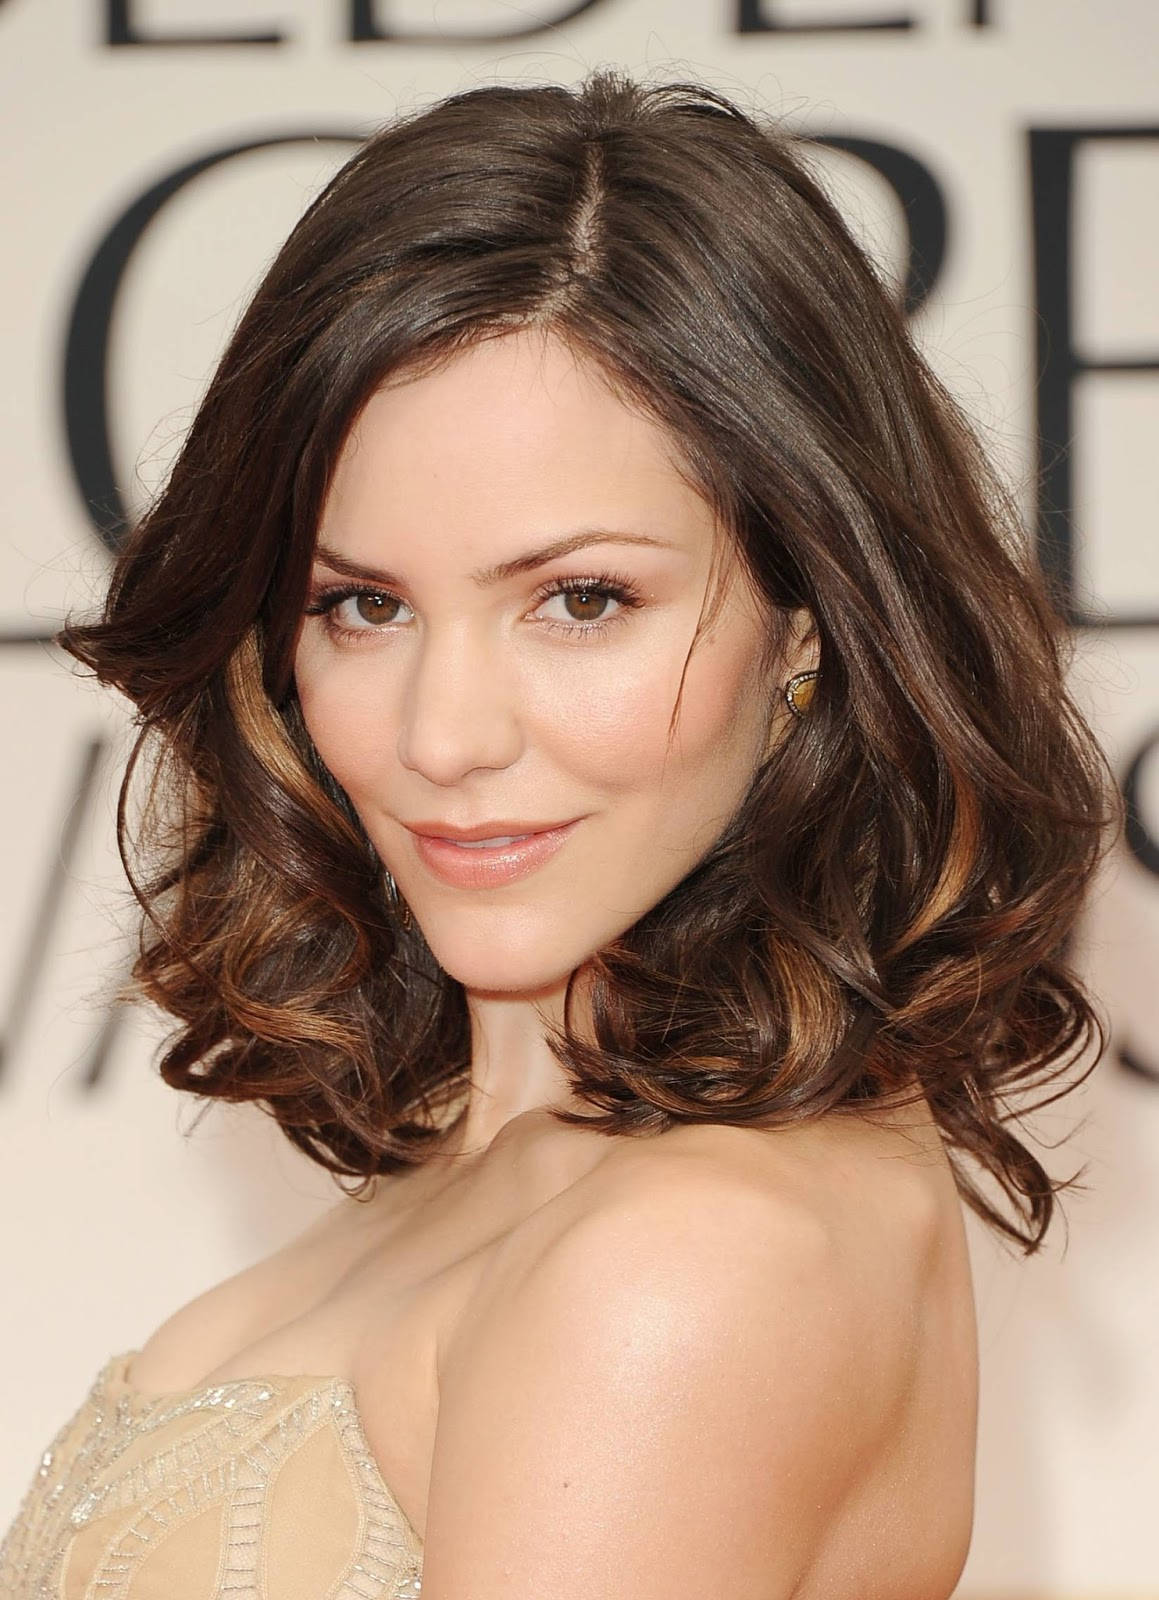 Awesome Cute Easy Hairstyles For Medium Length Hair Carolin Style Short Hairstyles Gunalazisus